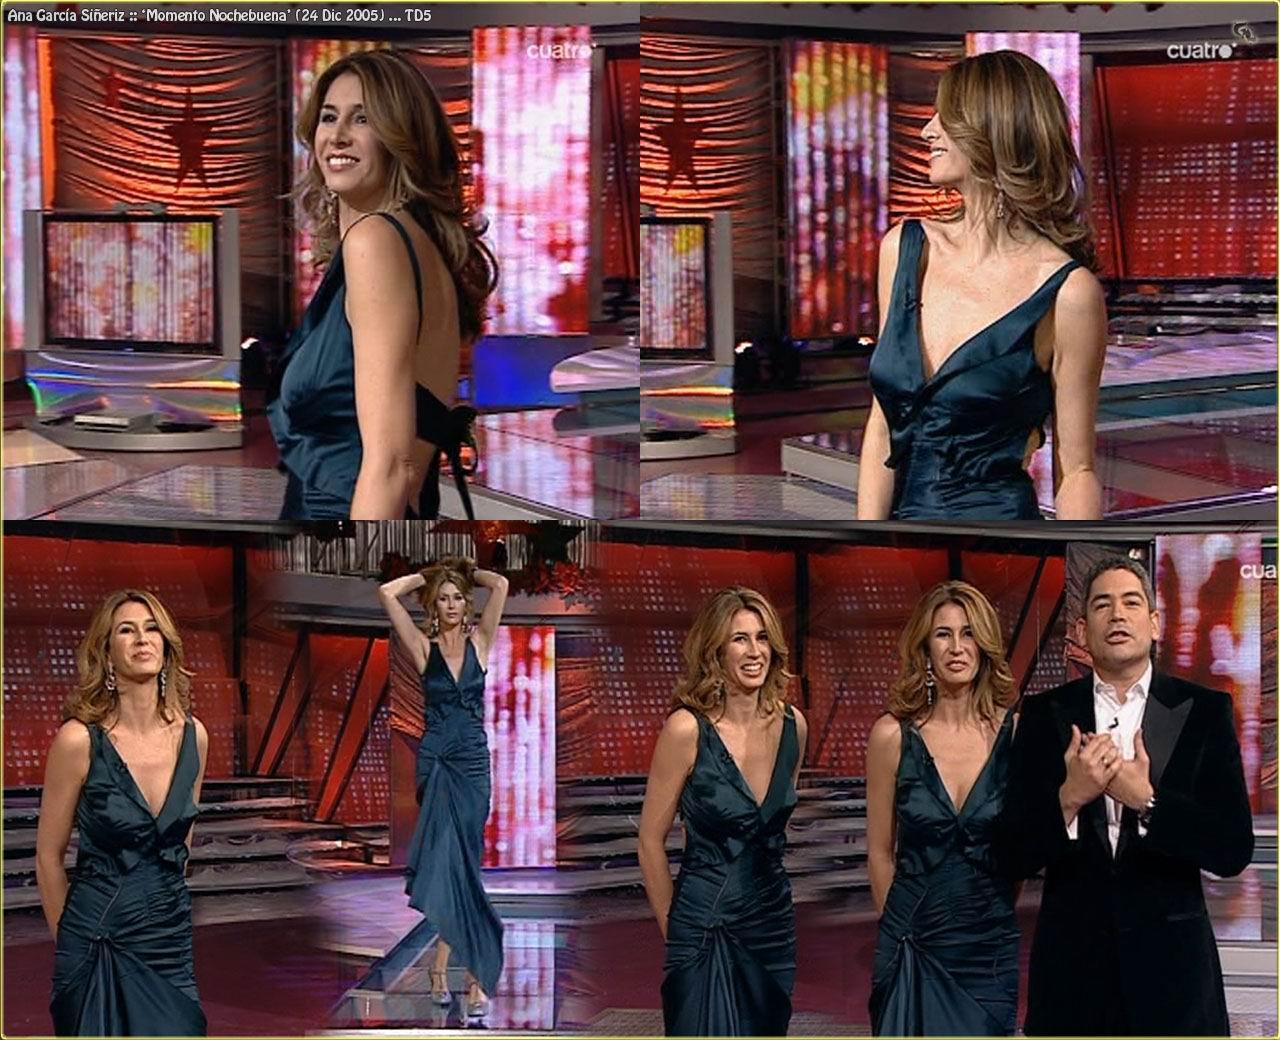 Ana Garcia Siñeriz Topless ana garcía-siñeriz nude, naked - pics and videos